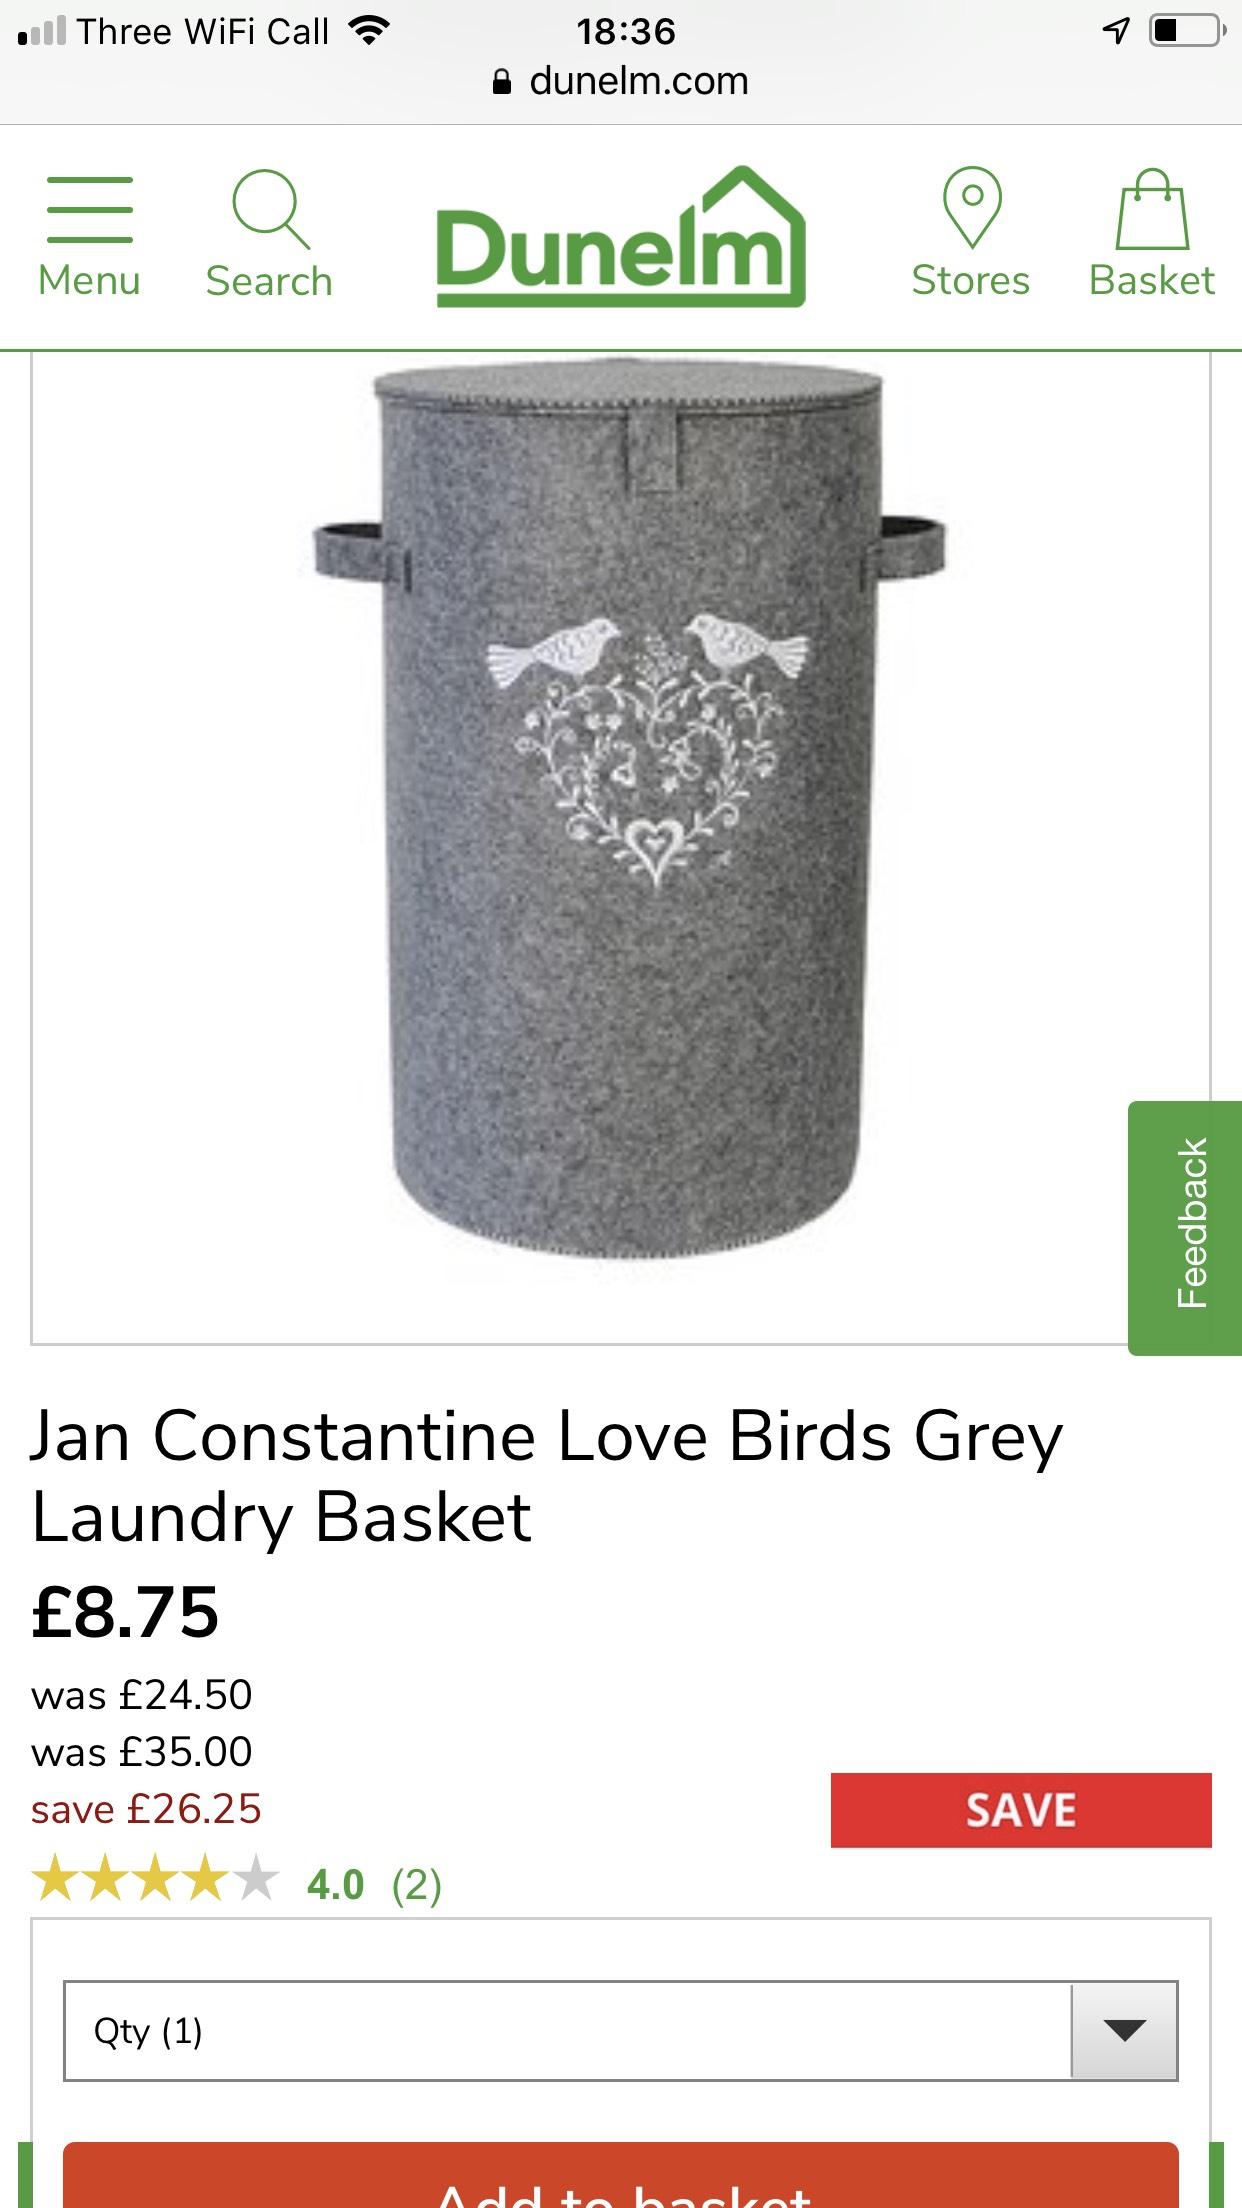 dunelm online jan constantine love birds grey laundry. Black Bedroom Furniture Sets. Home Design Ideas